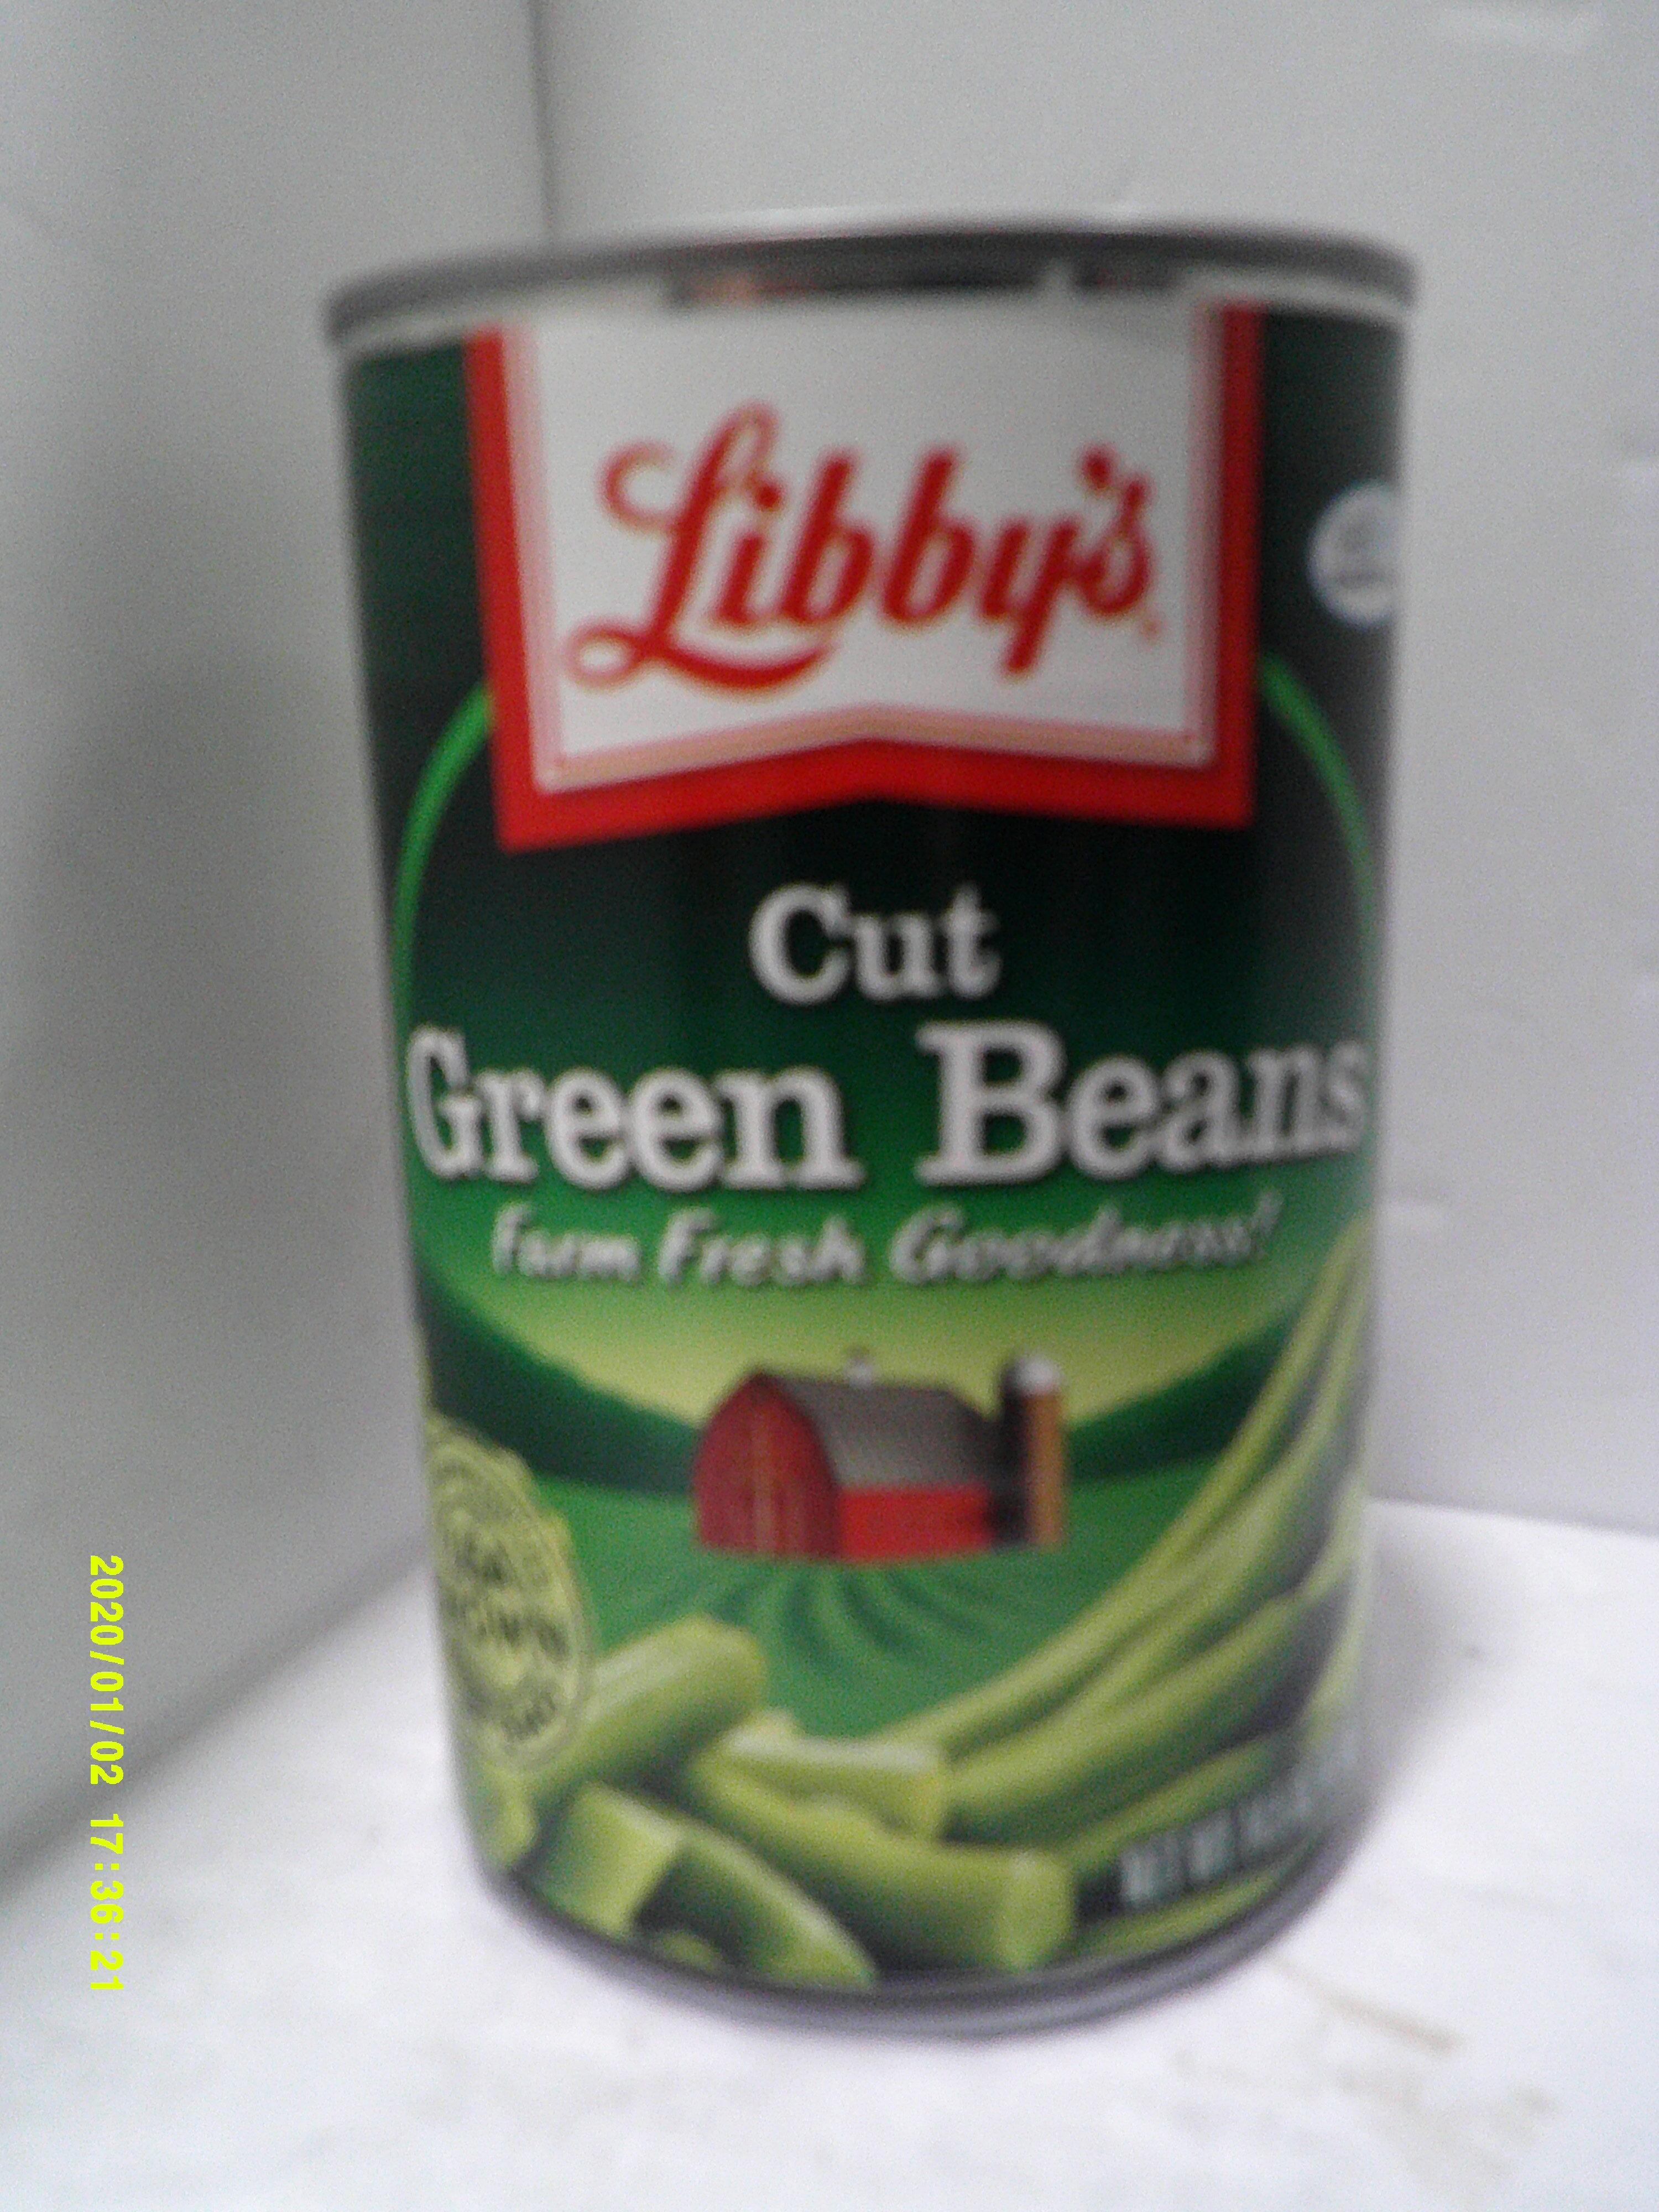 Cut green beans - Prodotto - en